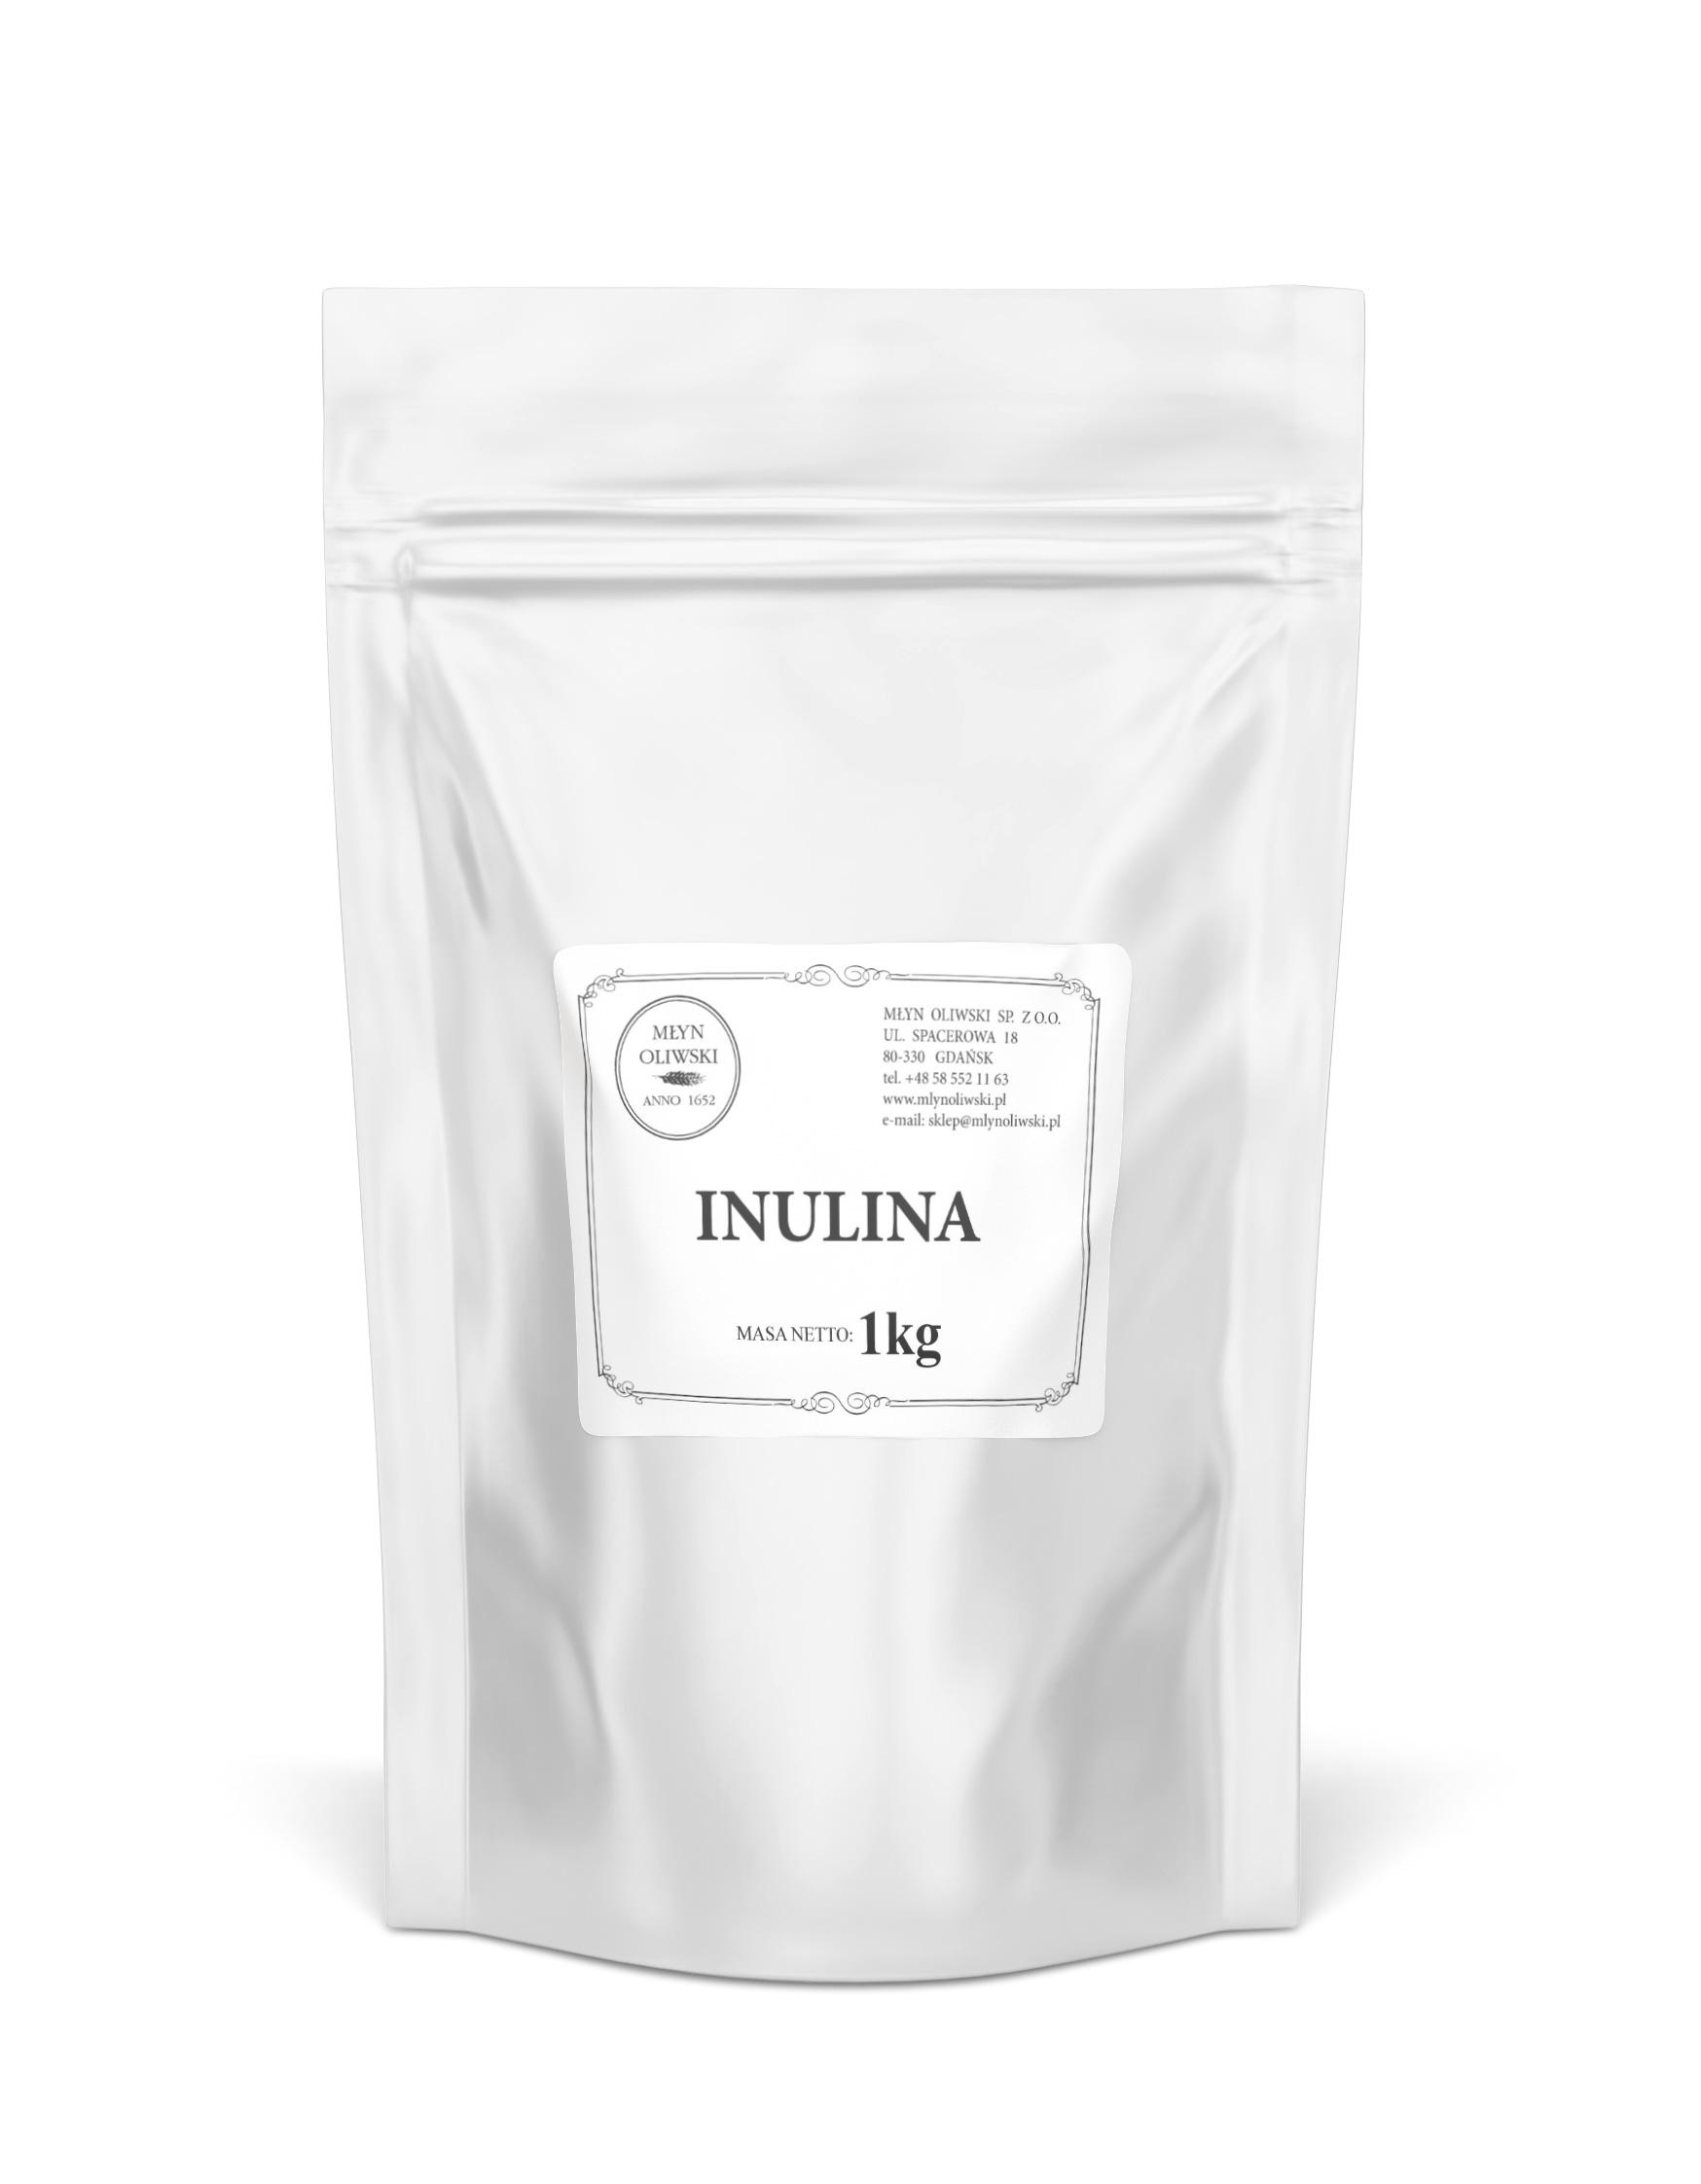 INULINA PREBIOTYK - 1kg